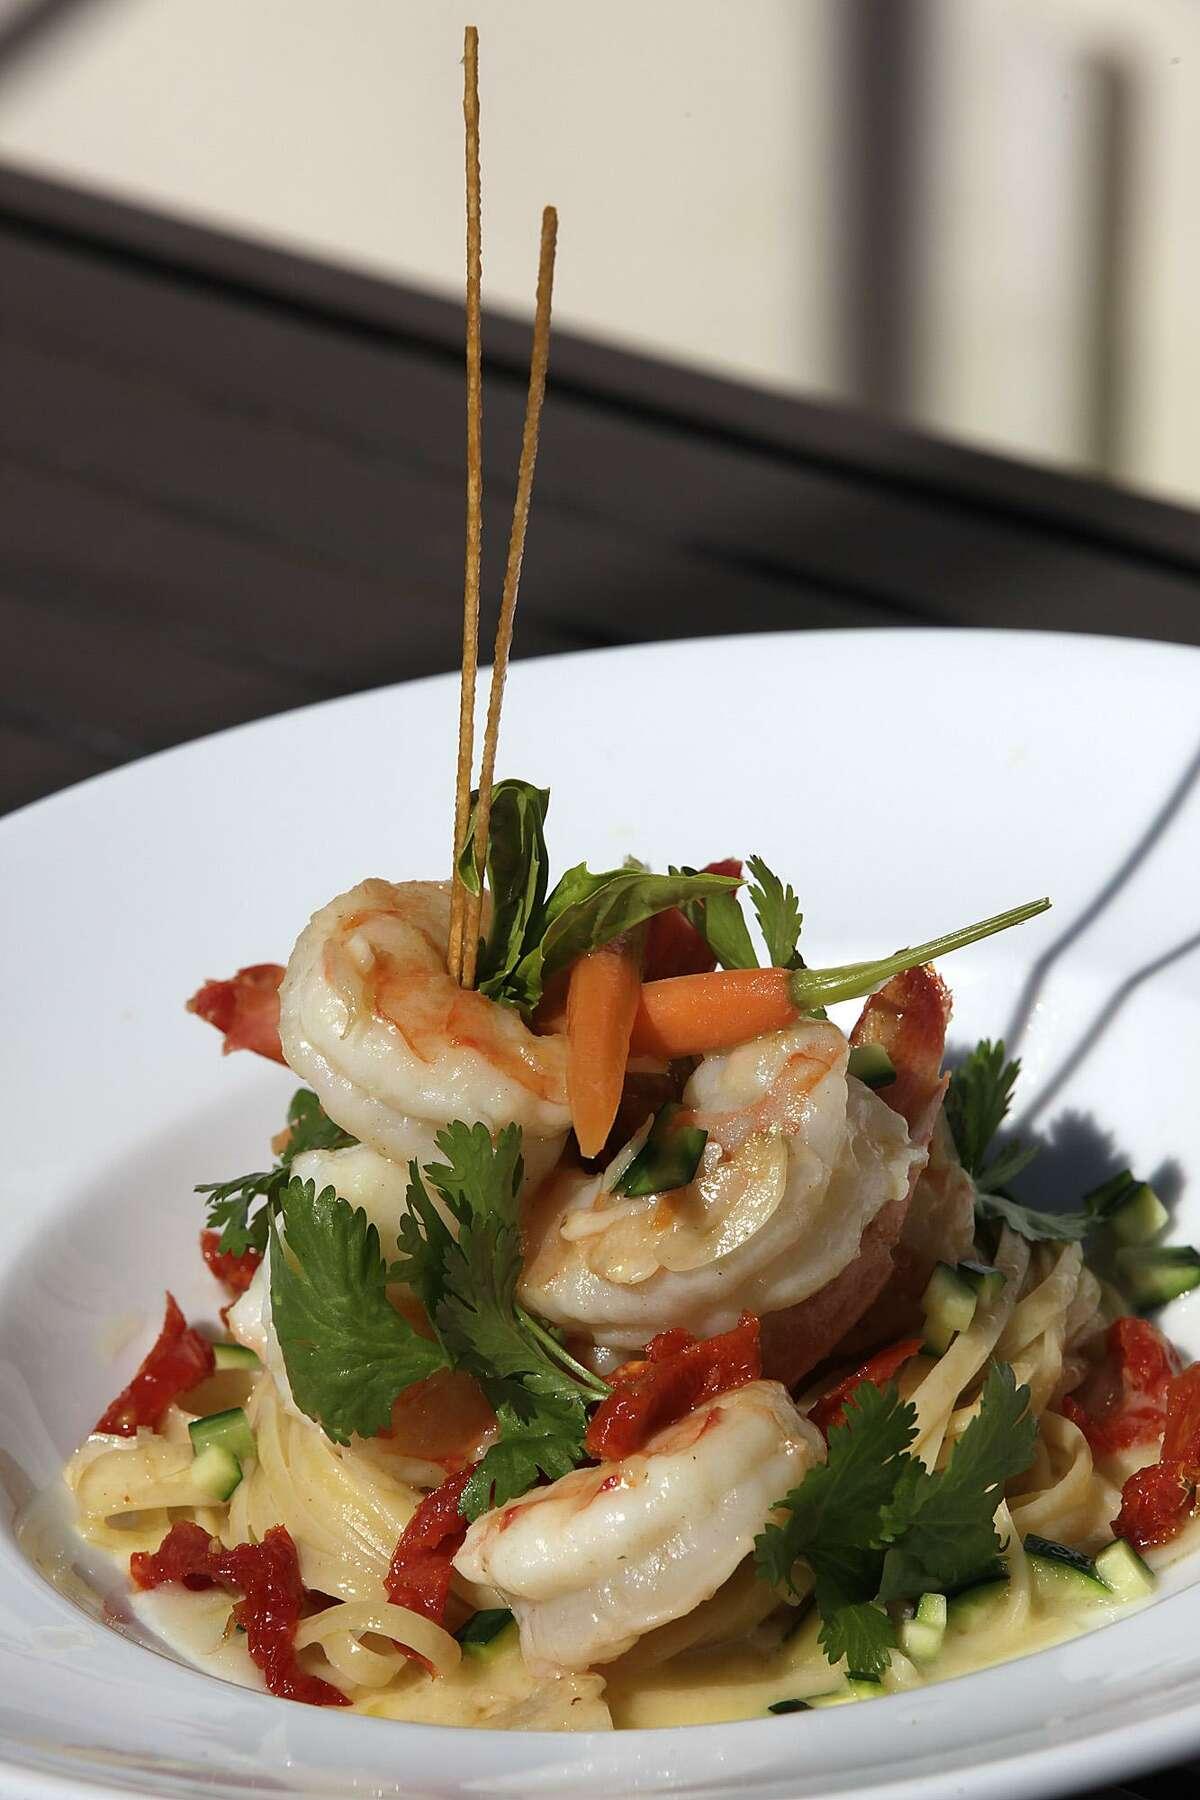 Texas Gulf Shrimp with Cilantro Butter and Linguine